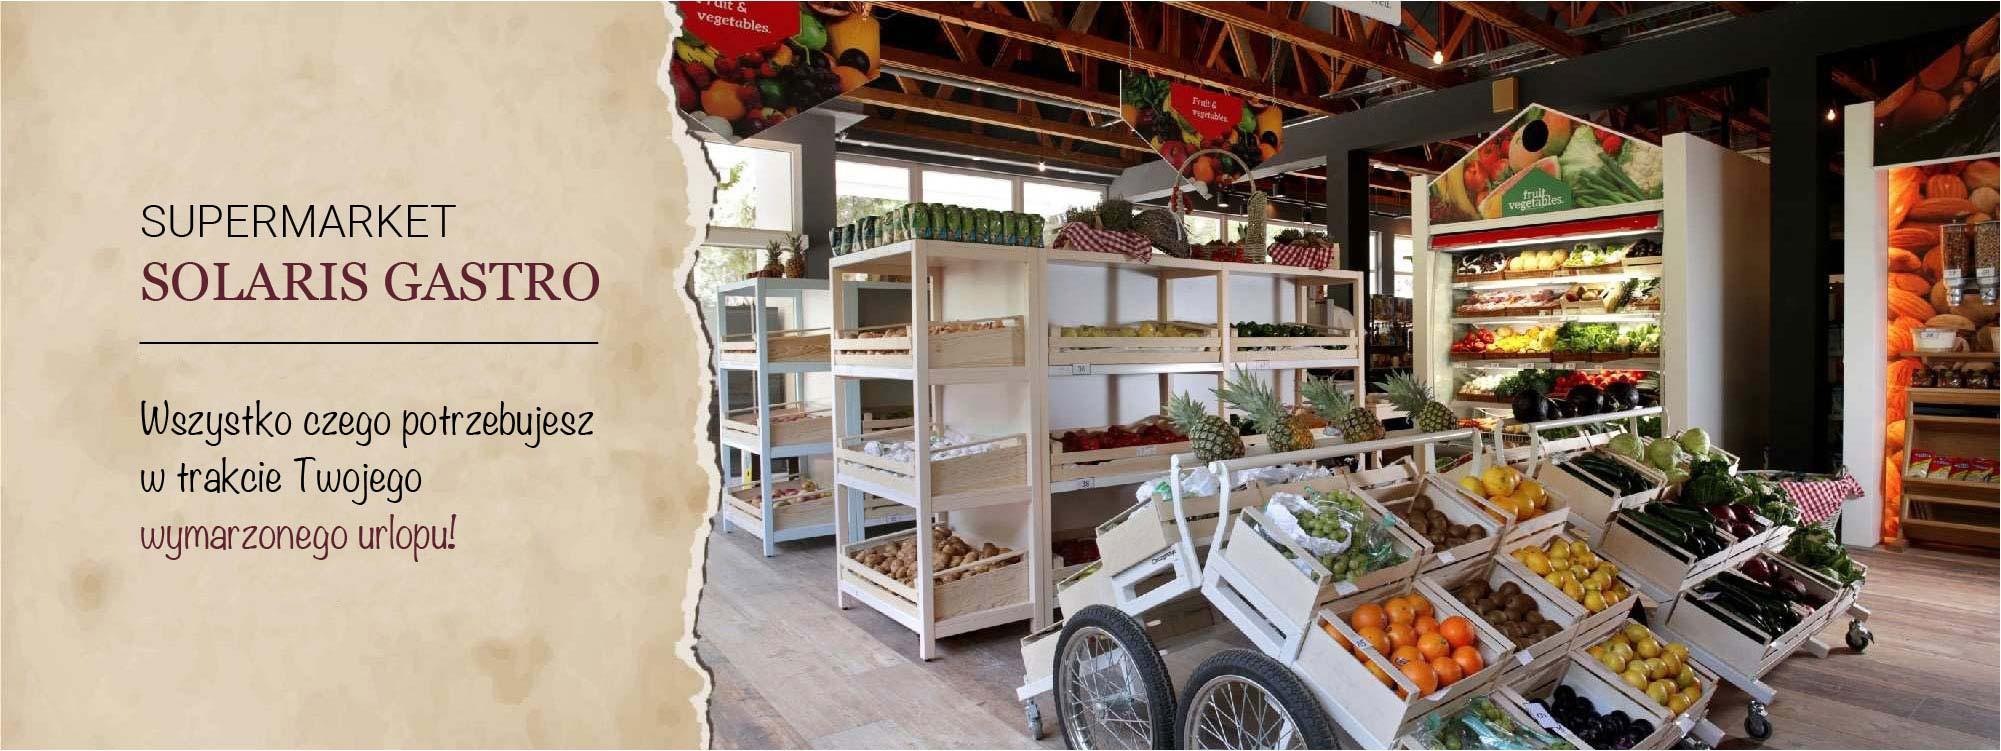 Web-slider-gastro-supermarket-POL